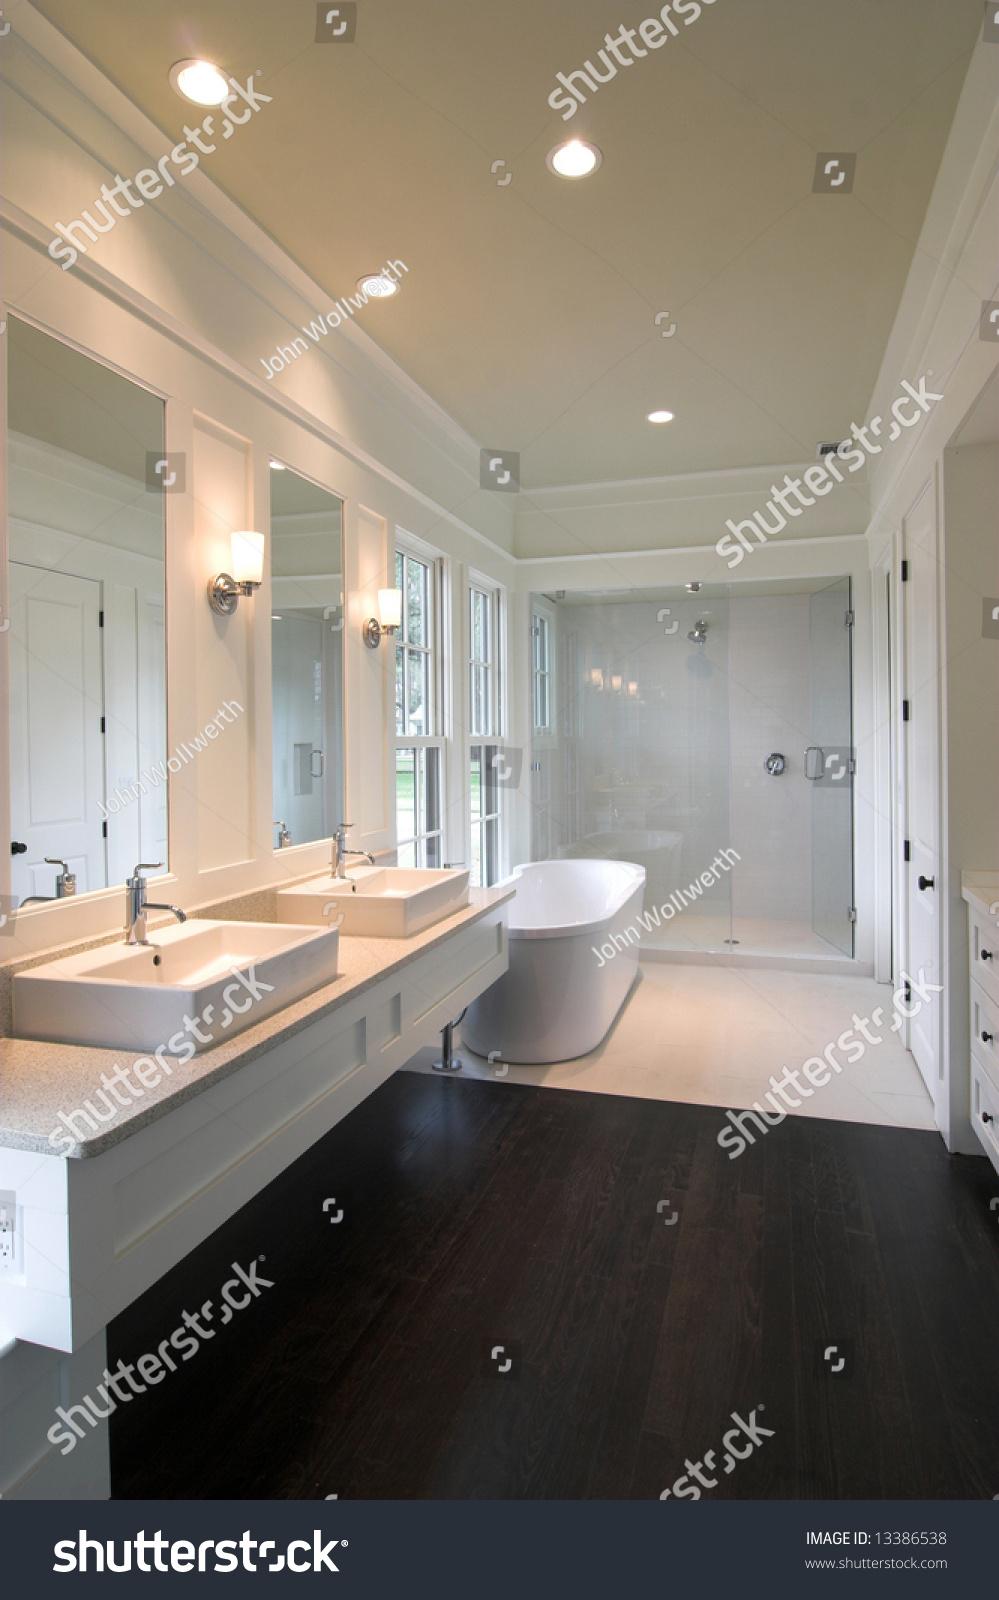 Dark wood floor bathroom - Luxurious Modern White Bathroom With Dark Wood Floors